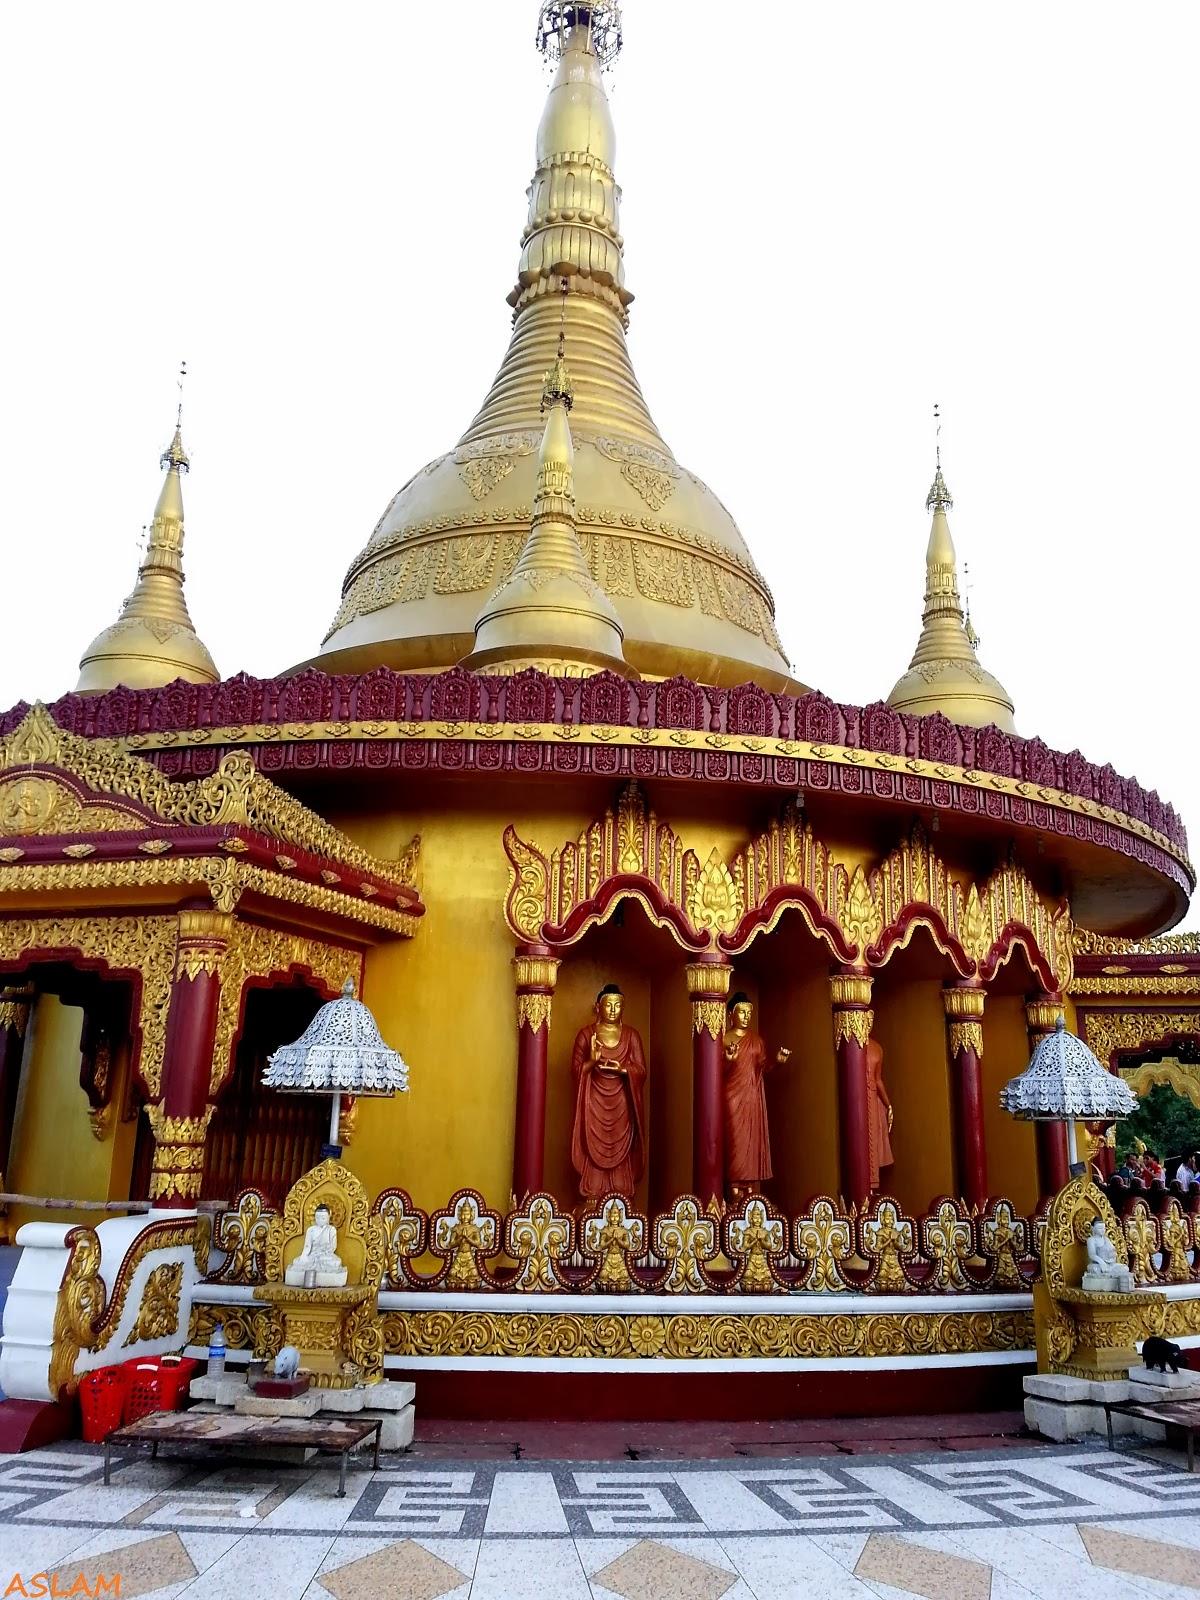 Bandarban Temple